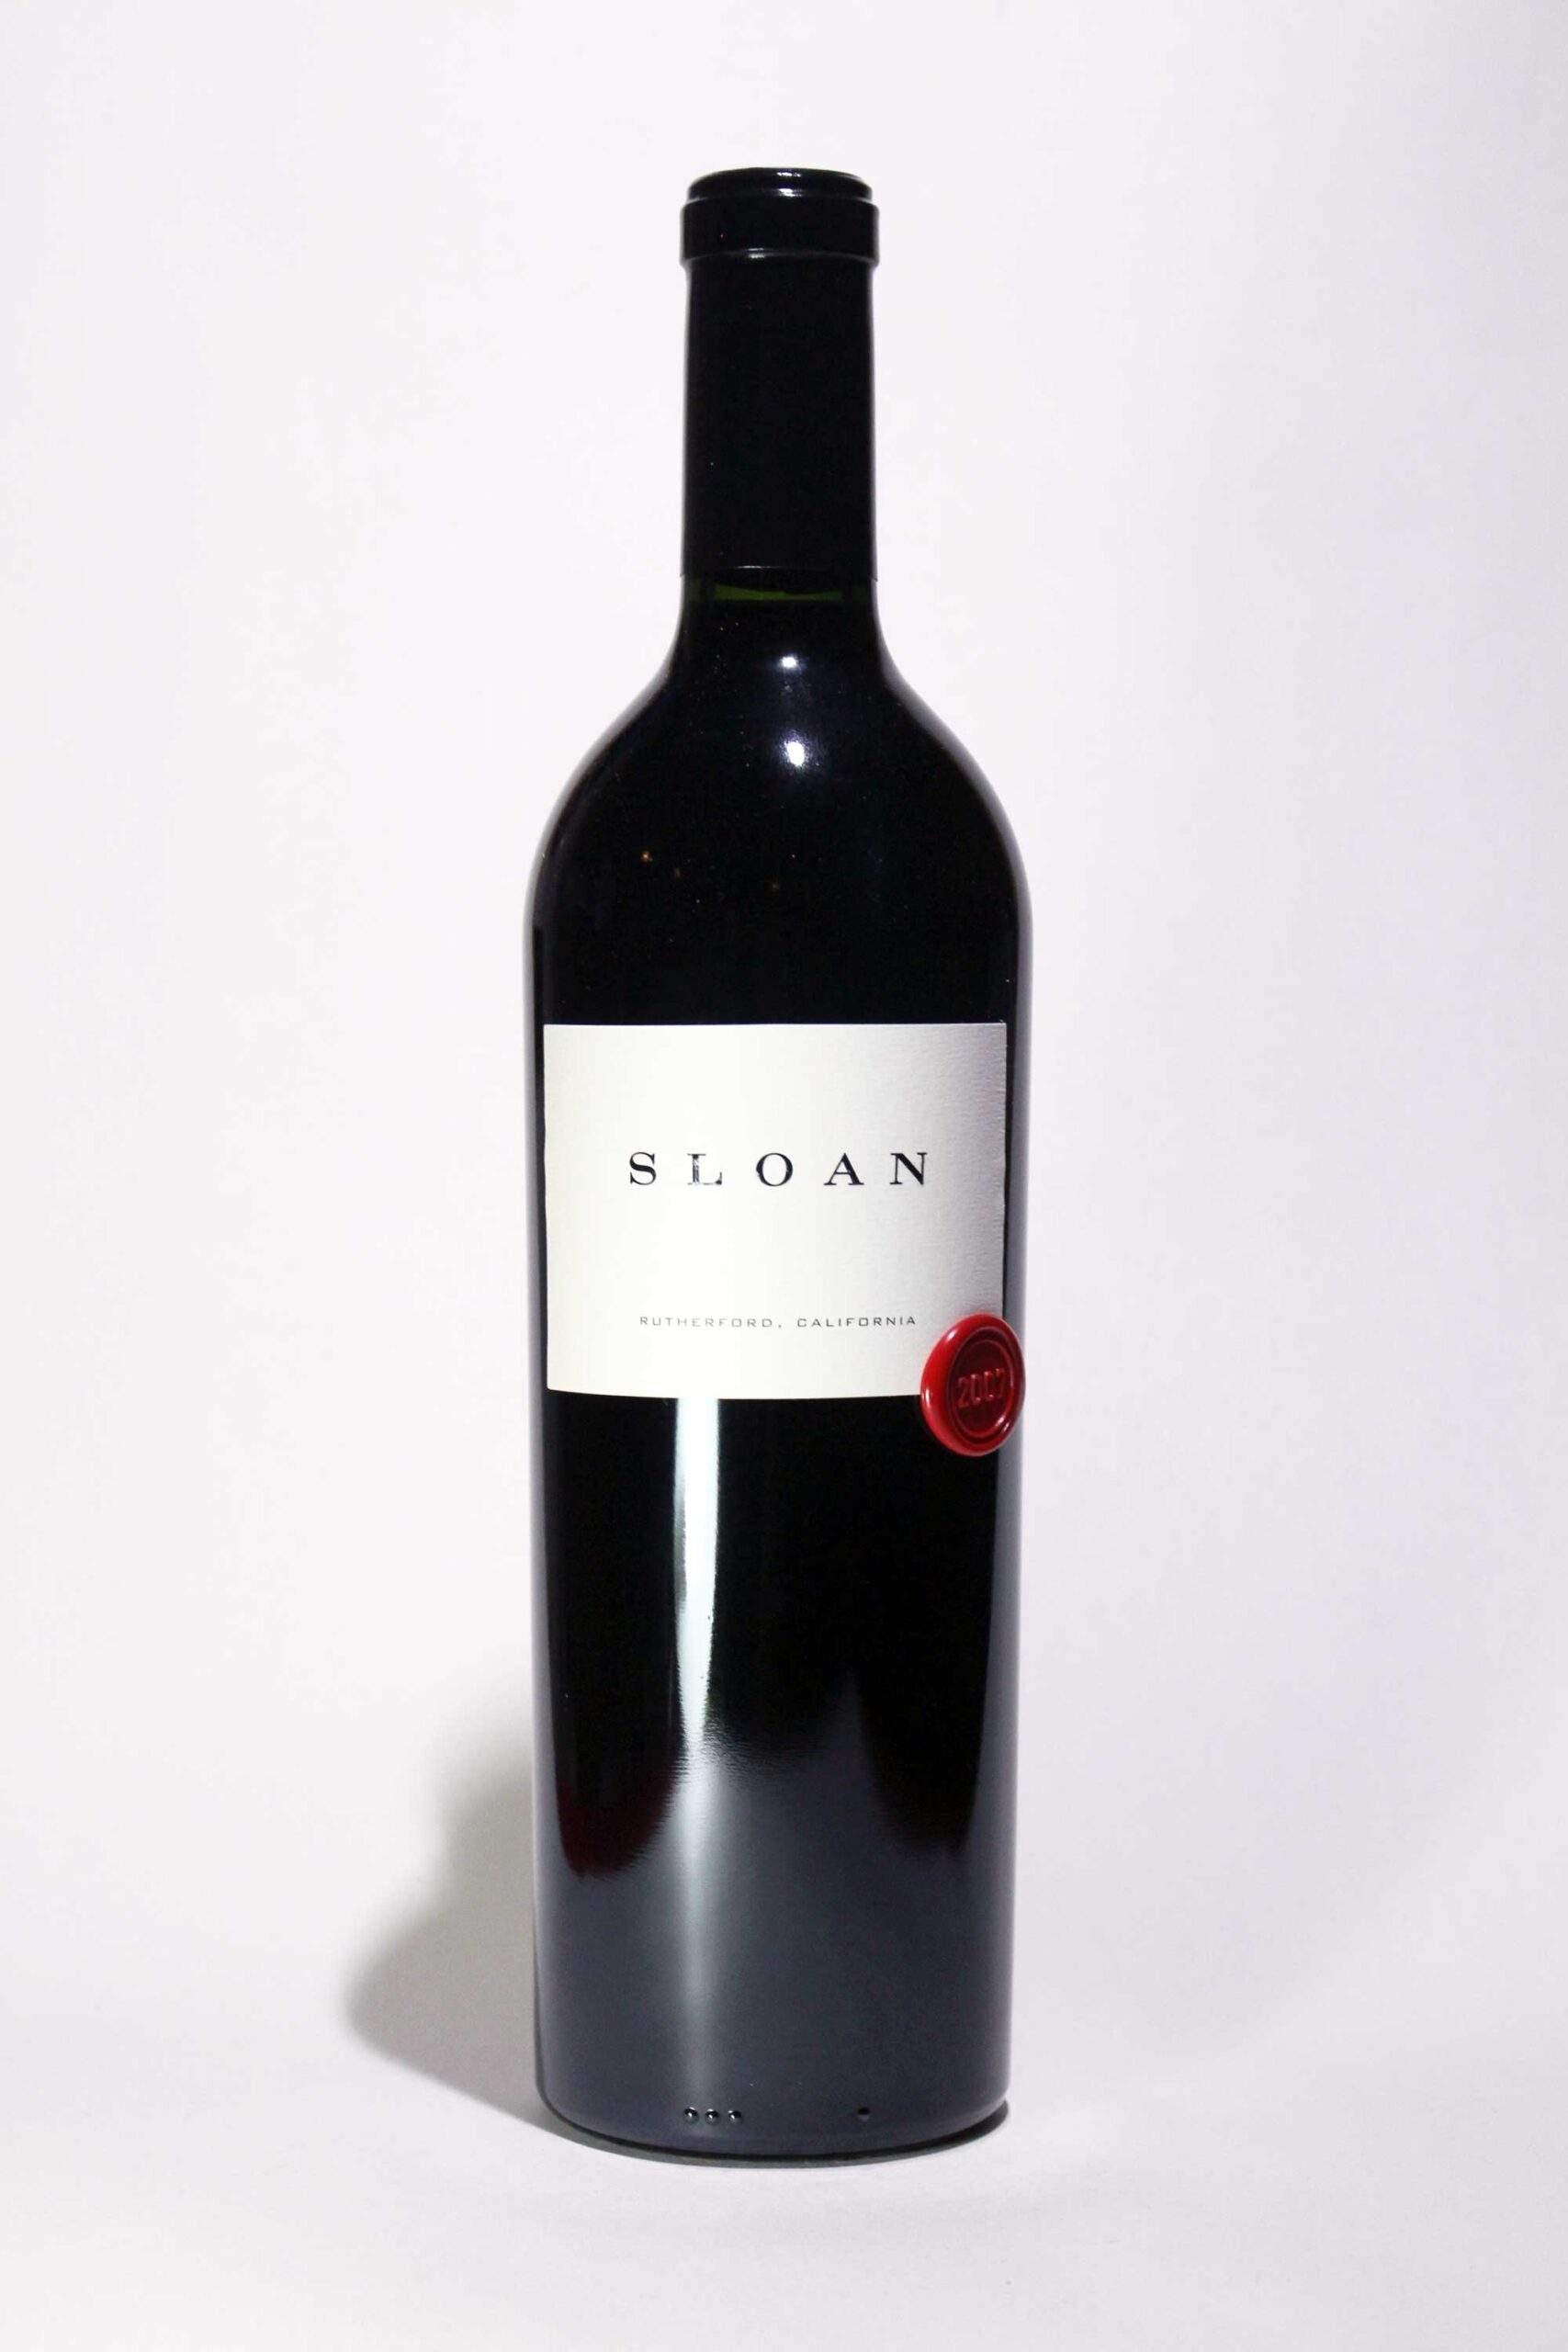 Sloan Proprietary Red 2007